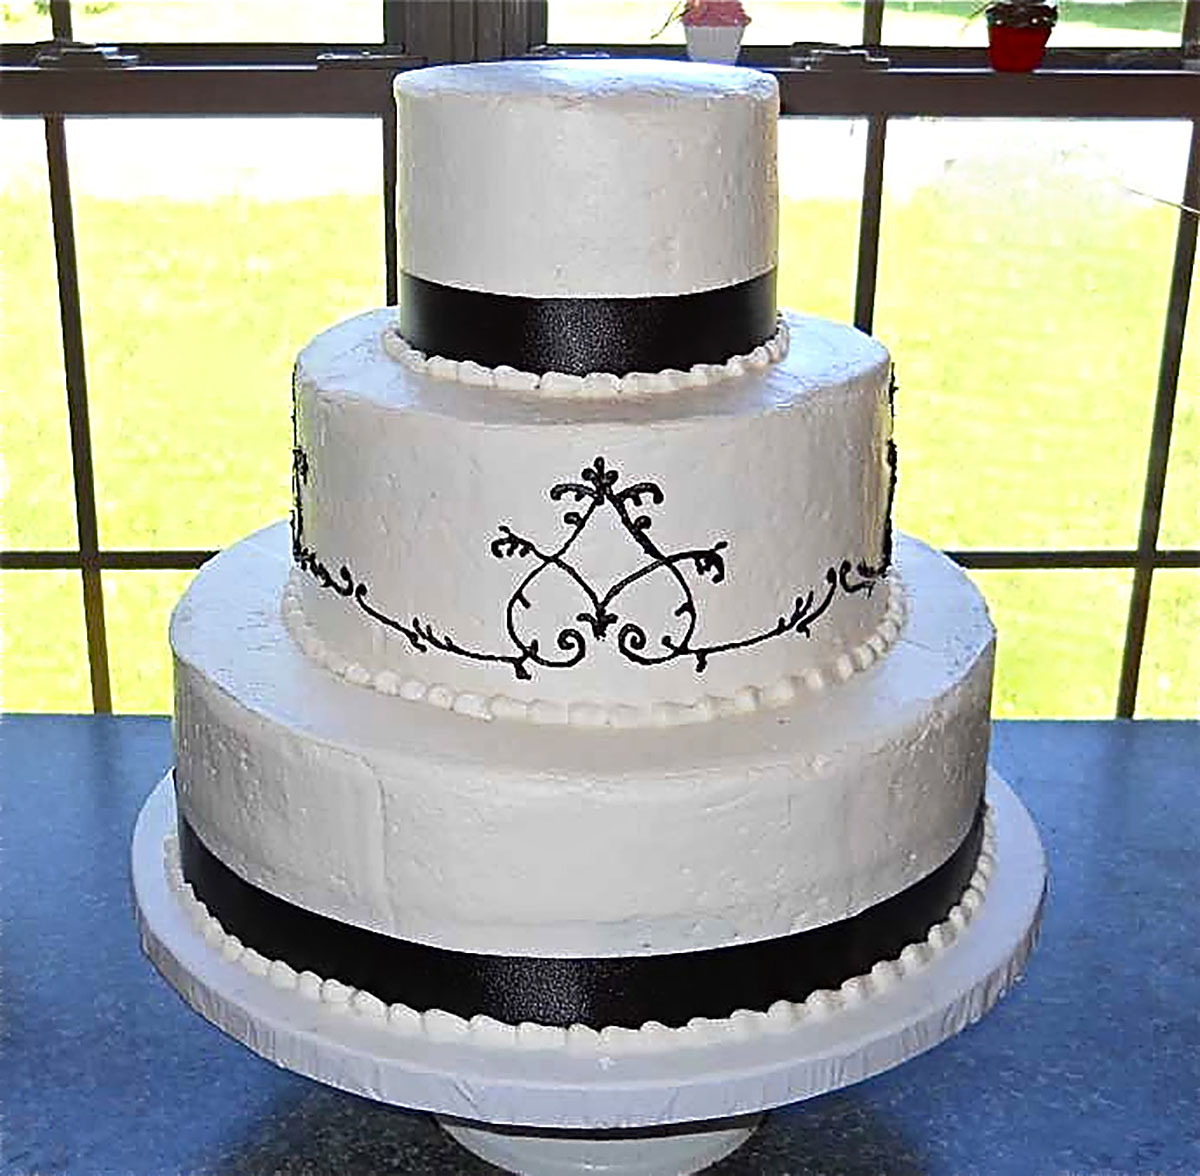 Delectables on Adirondack Weddings   Adirondack Weddings Bakery